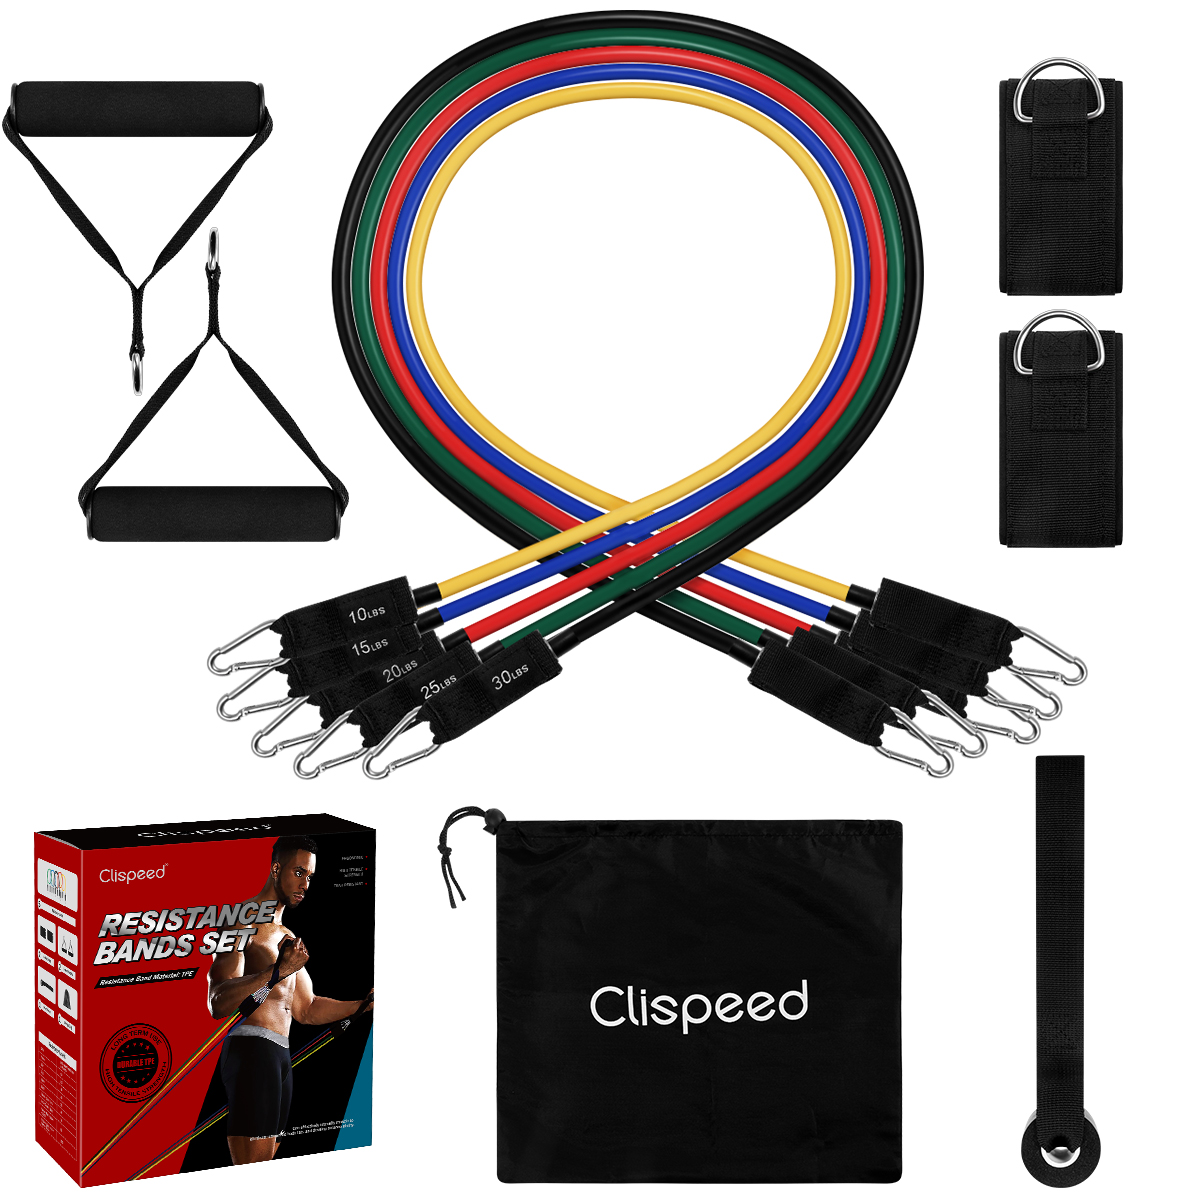 11pcs Resistance Bands Set Stackable Workout Fitness Bands With Door Anchor Ankle Straps Foam Handles Storage Bag For Gymnastics